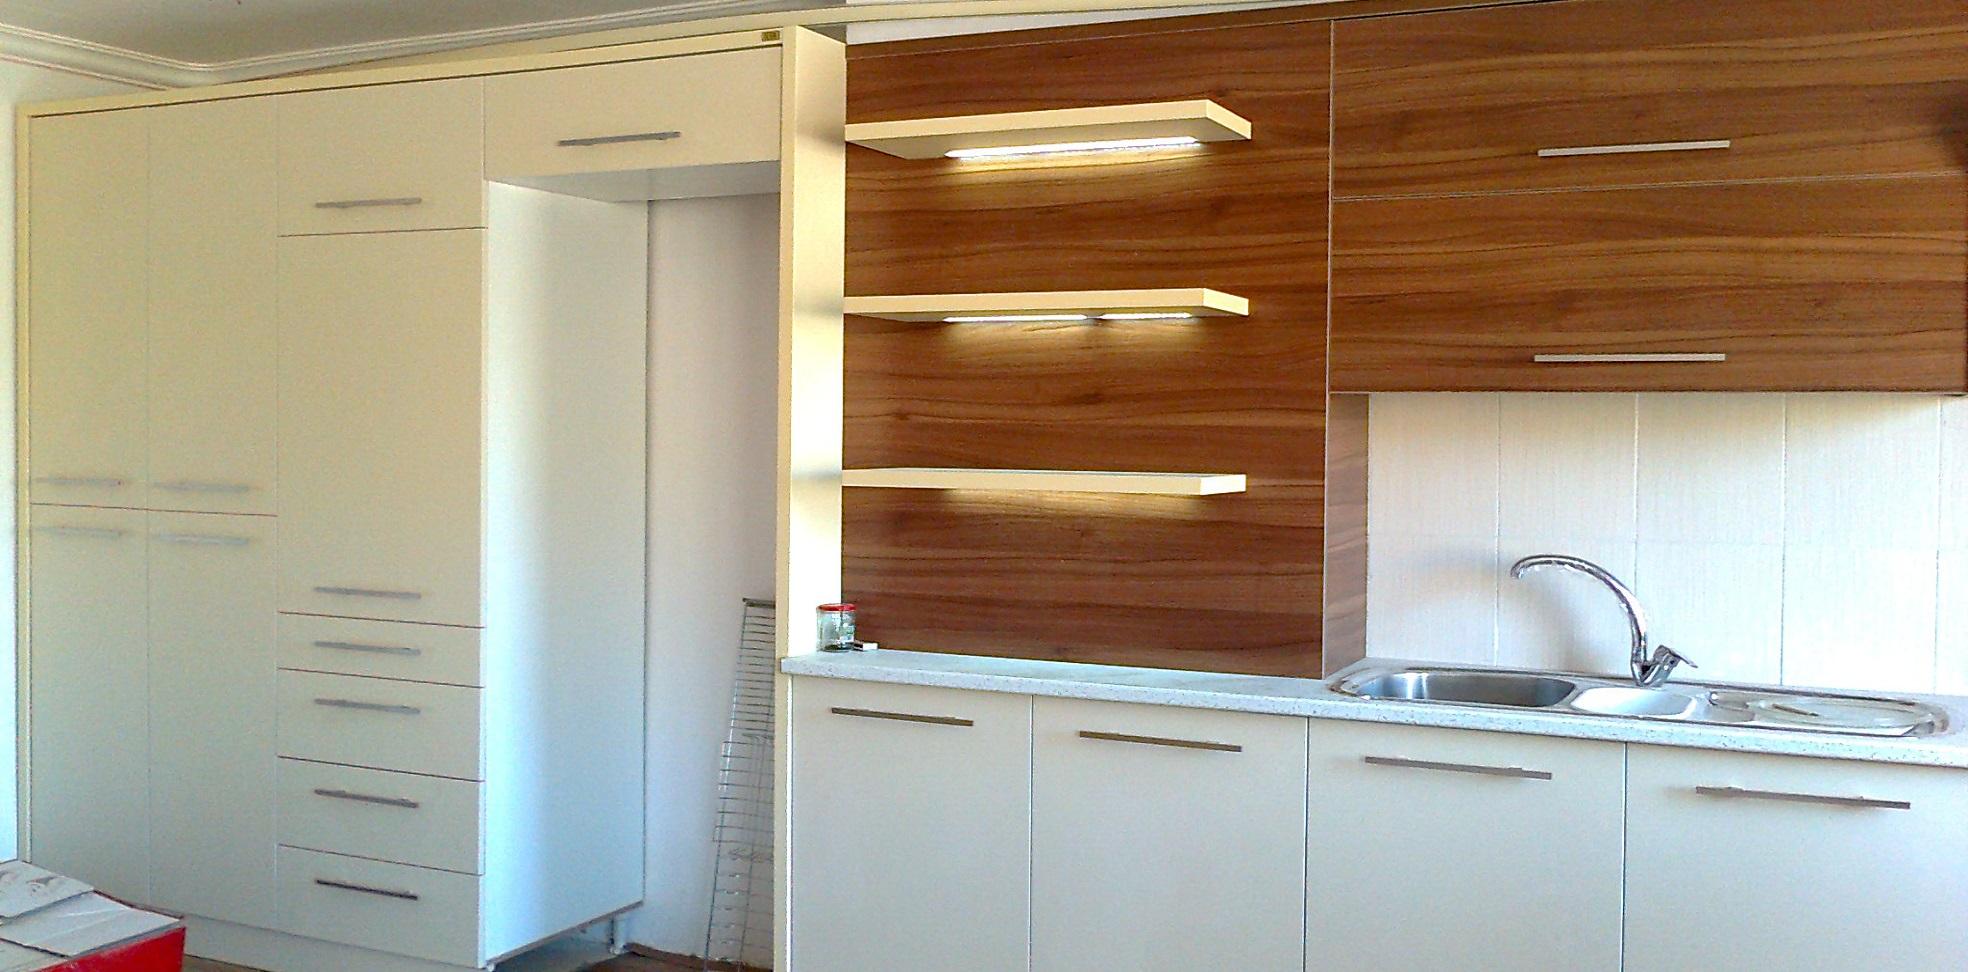 نمونه کابینت آشپزخانه 2016